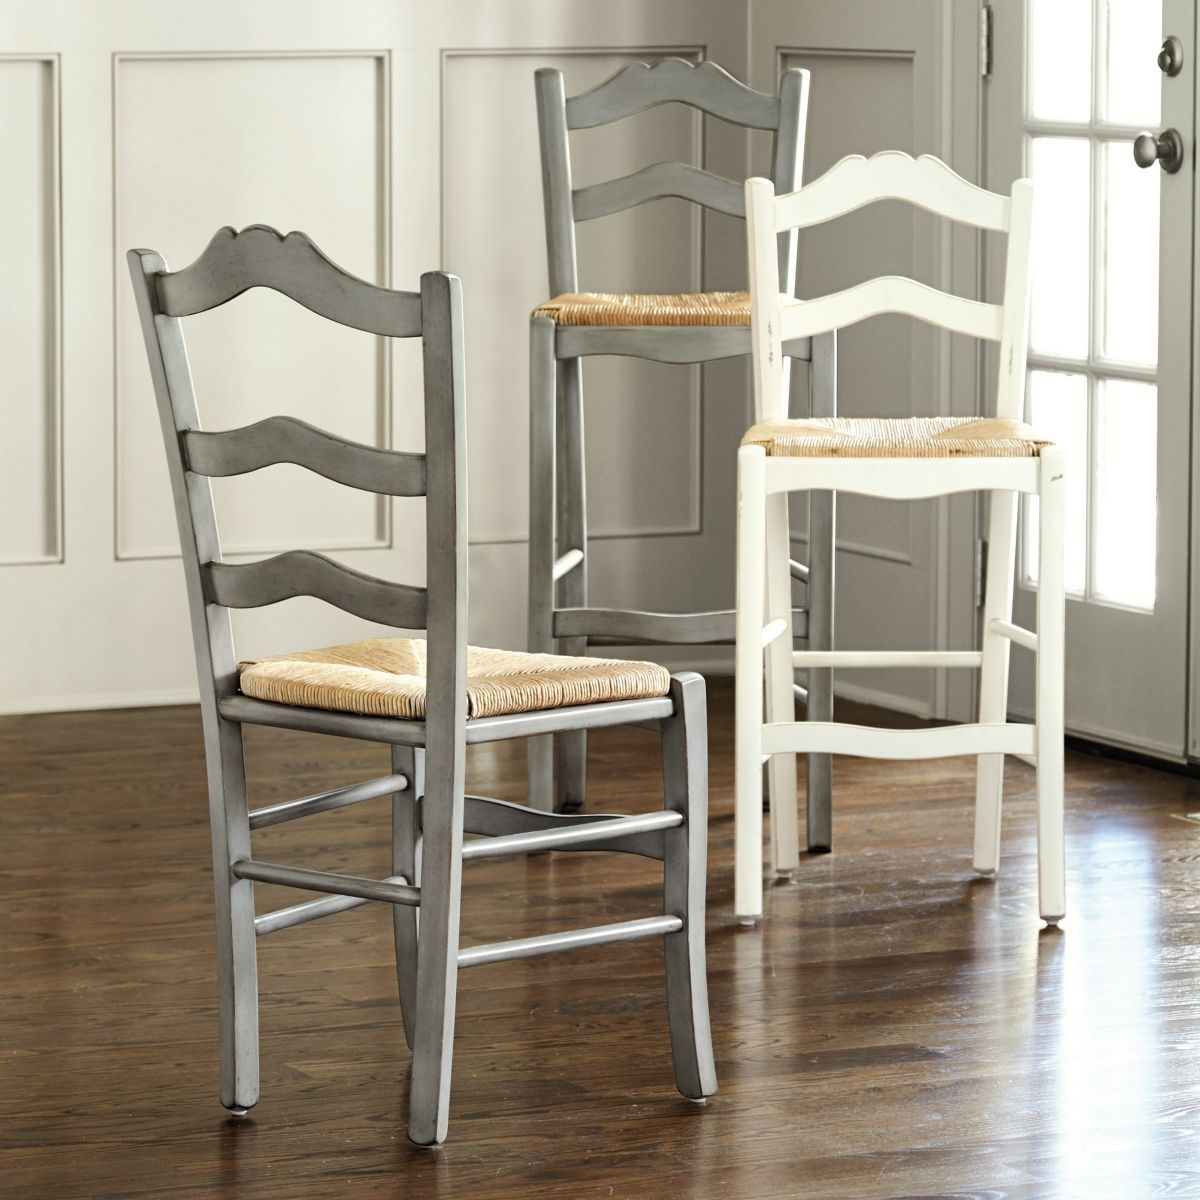 lemans barstool, ballard designs | furniture | dining chairs, dining